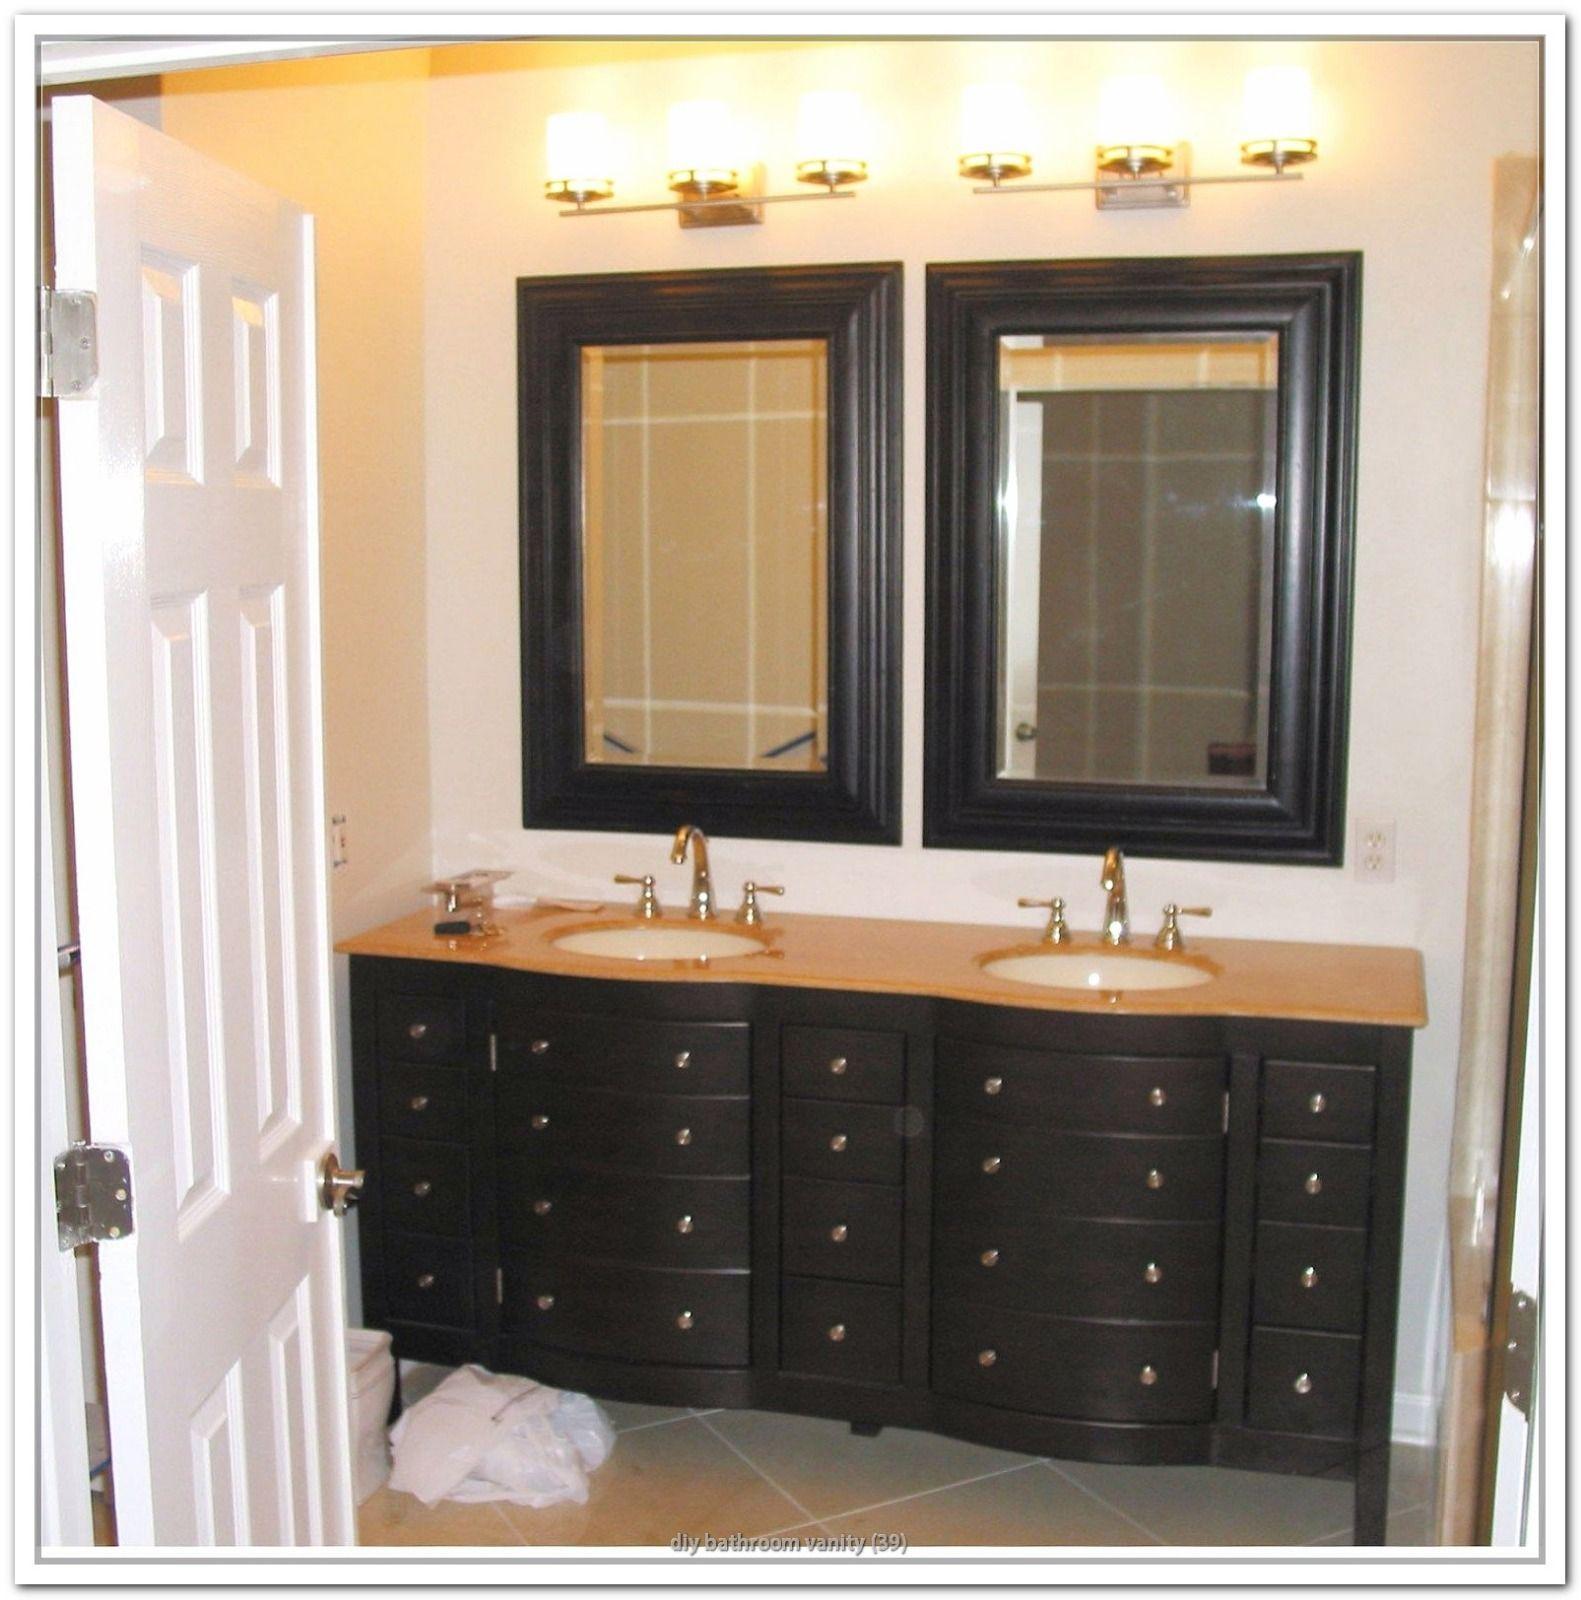 Large White Mirror 53 X29 White Bathroom Vanity Mirror White Modern Decor Bathroom Full Length M Bathroom Vanity Decor White Vanity Bathroom Eclectic Bathroom